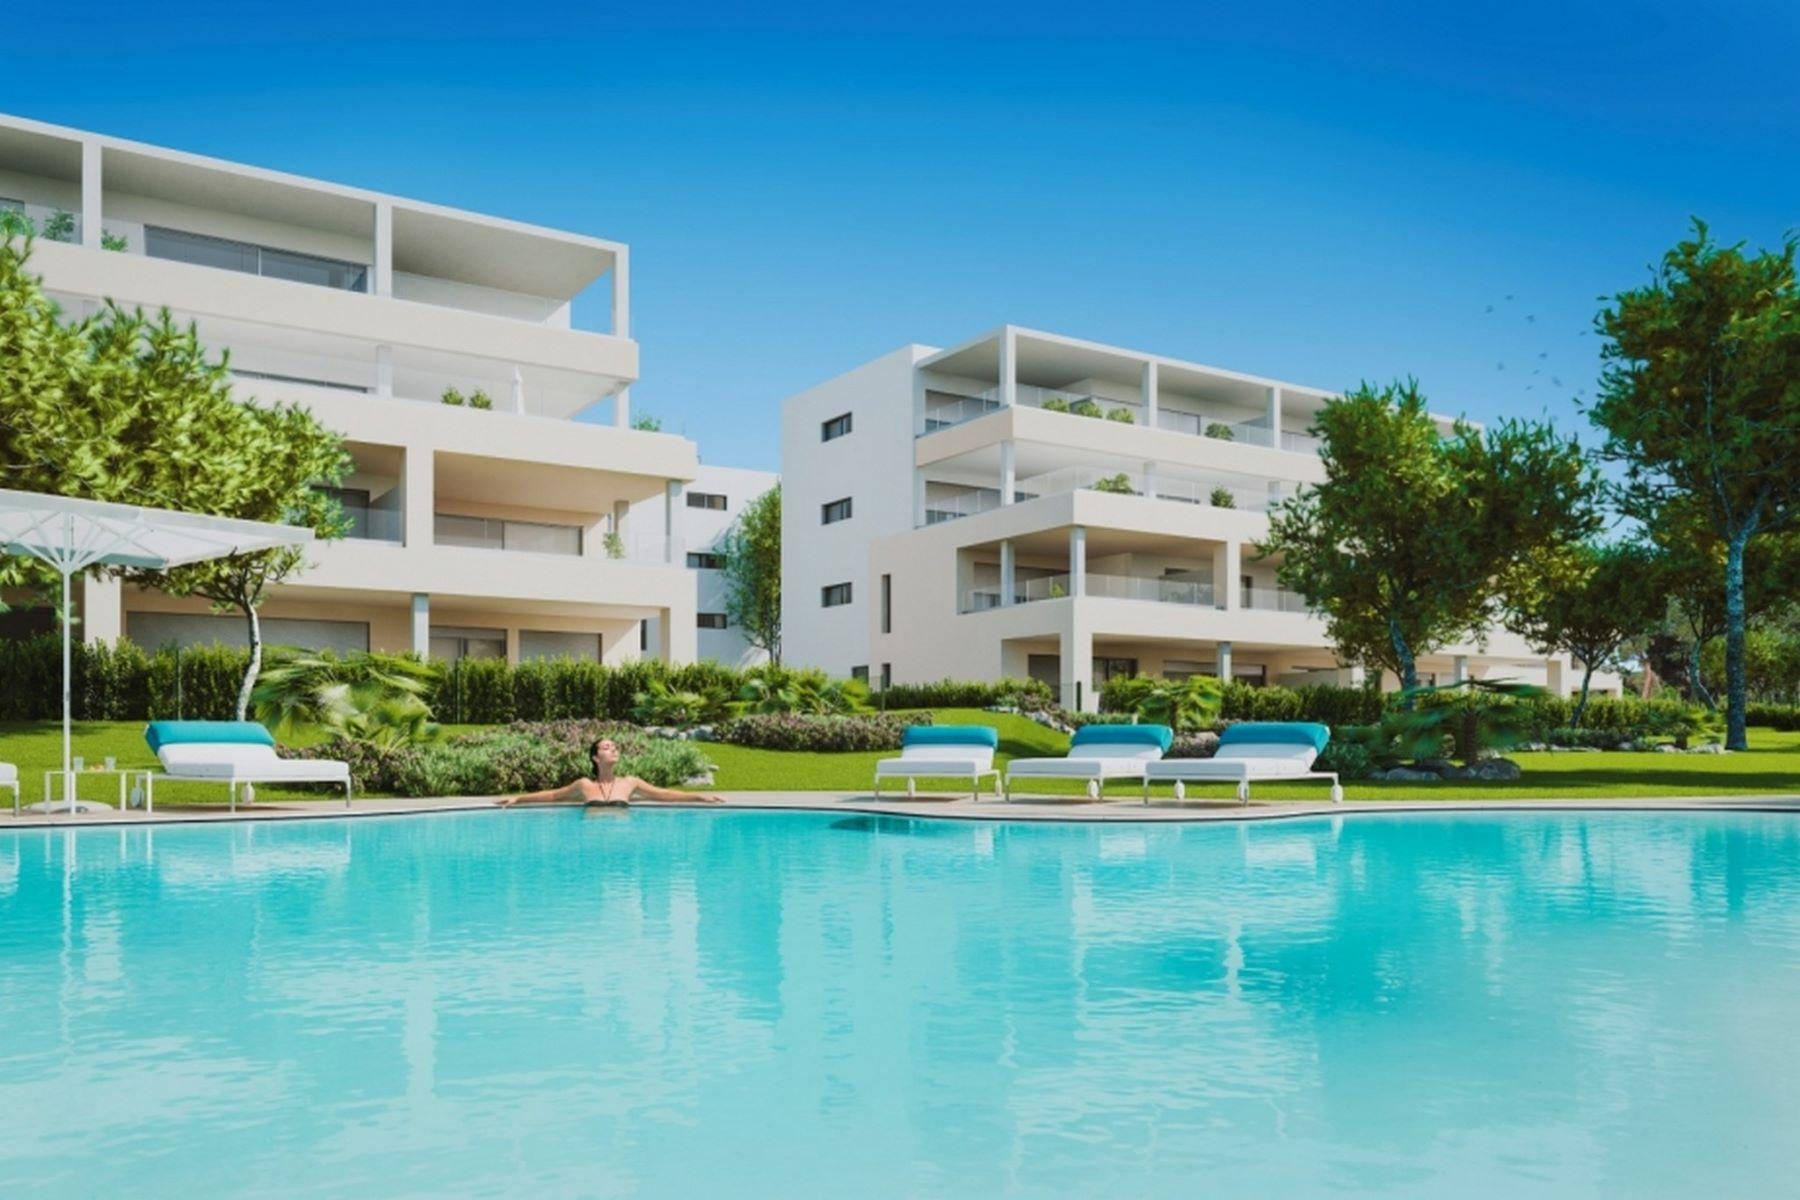 Apartment for Sale at New luxury apartments in Nova Santa Ponsa Santa Ponsa, Balearic Islands, Spain